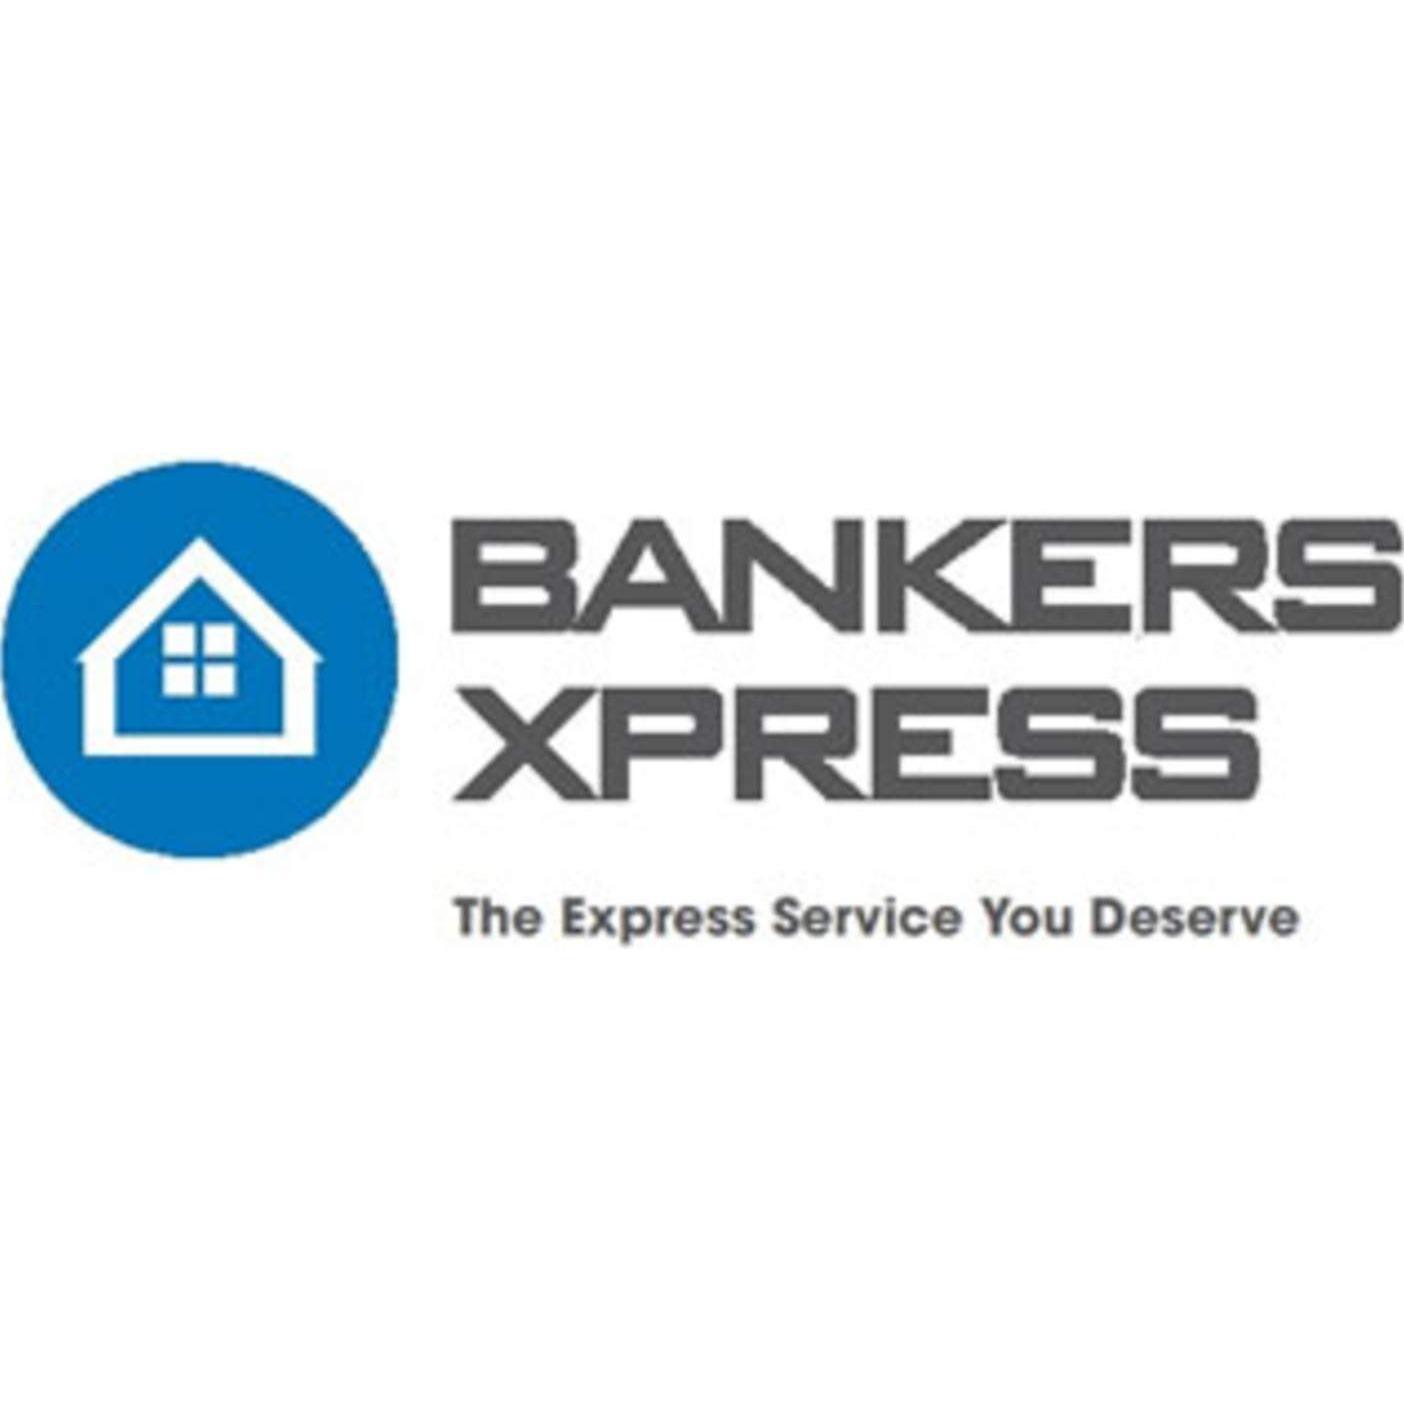 Toufiq Moosani - Bankers Xpress, LLC - The Mortgage Guru image 1